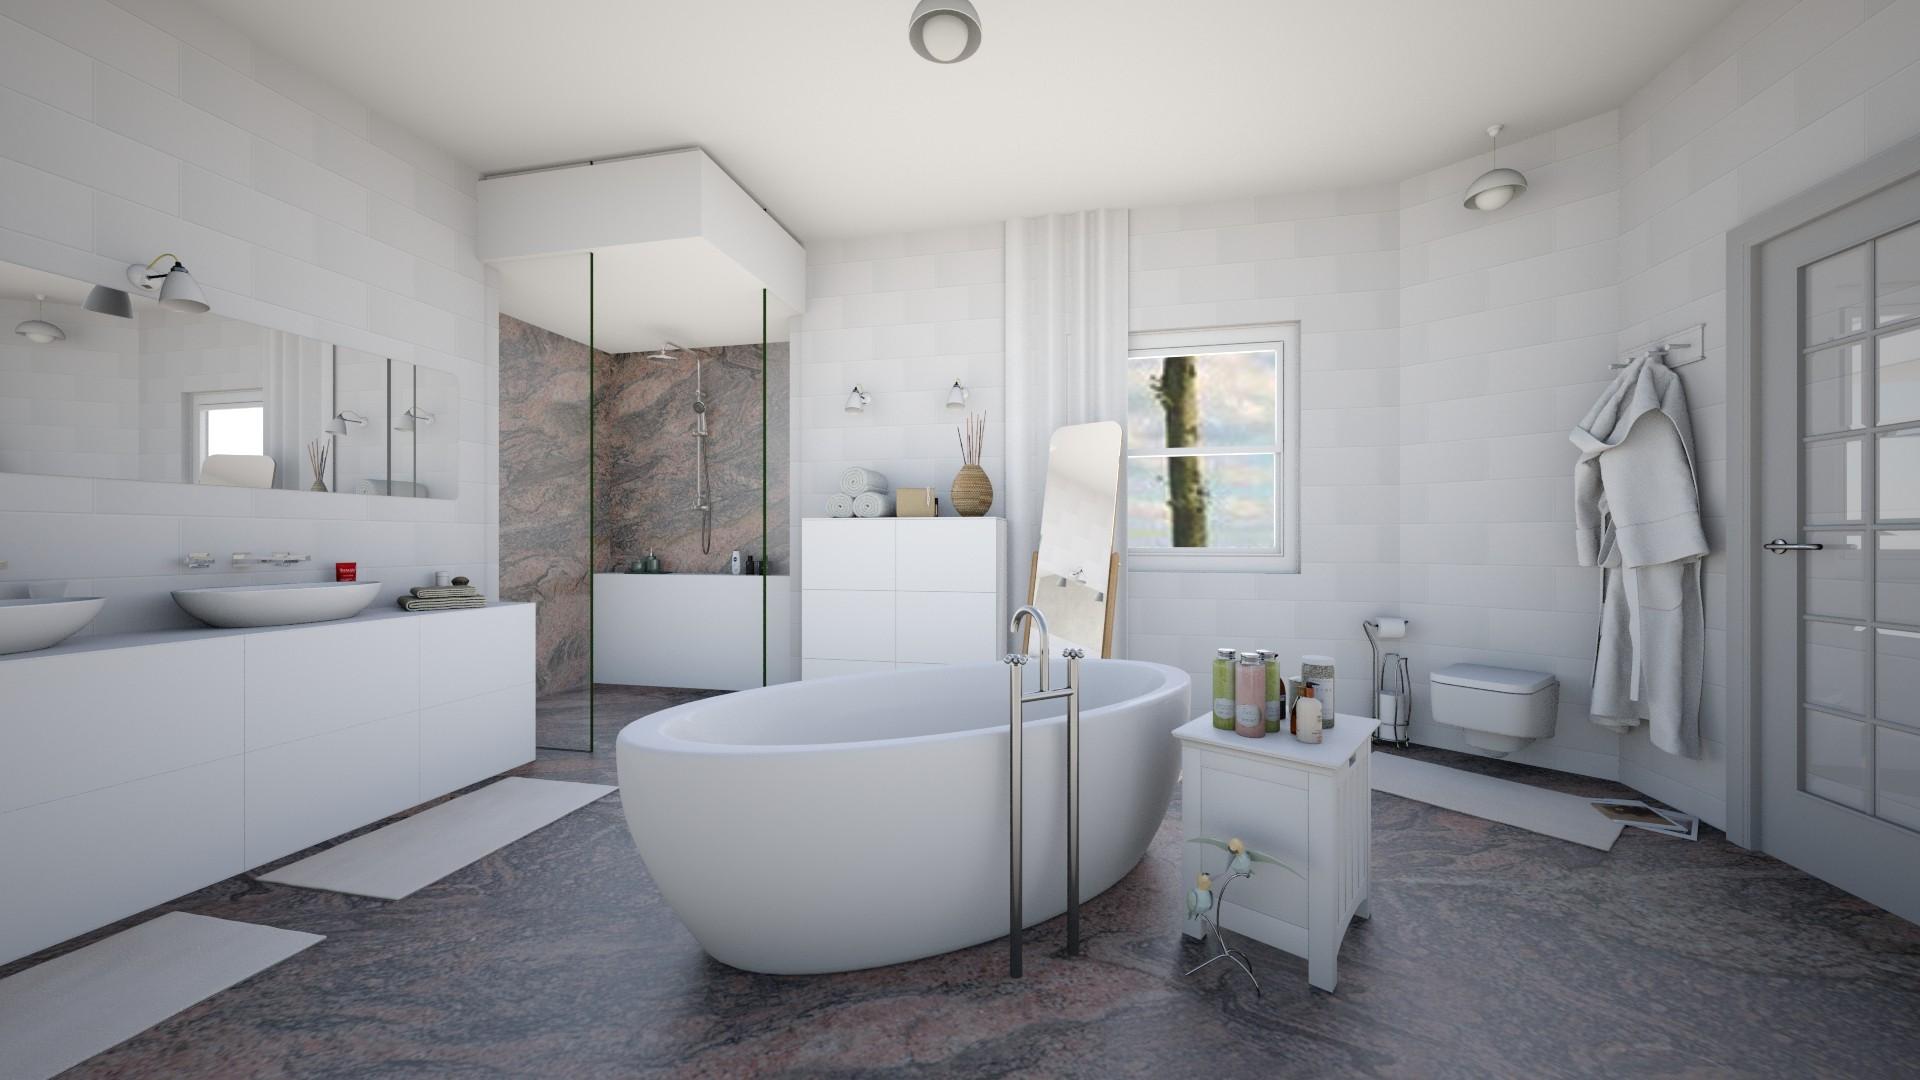 seifira - Modern - Bathroom - by ned31